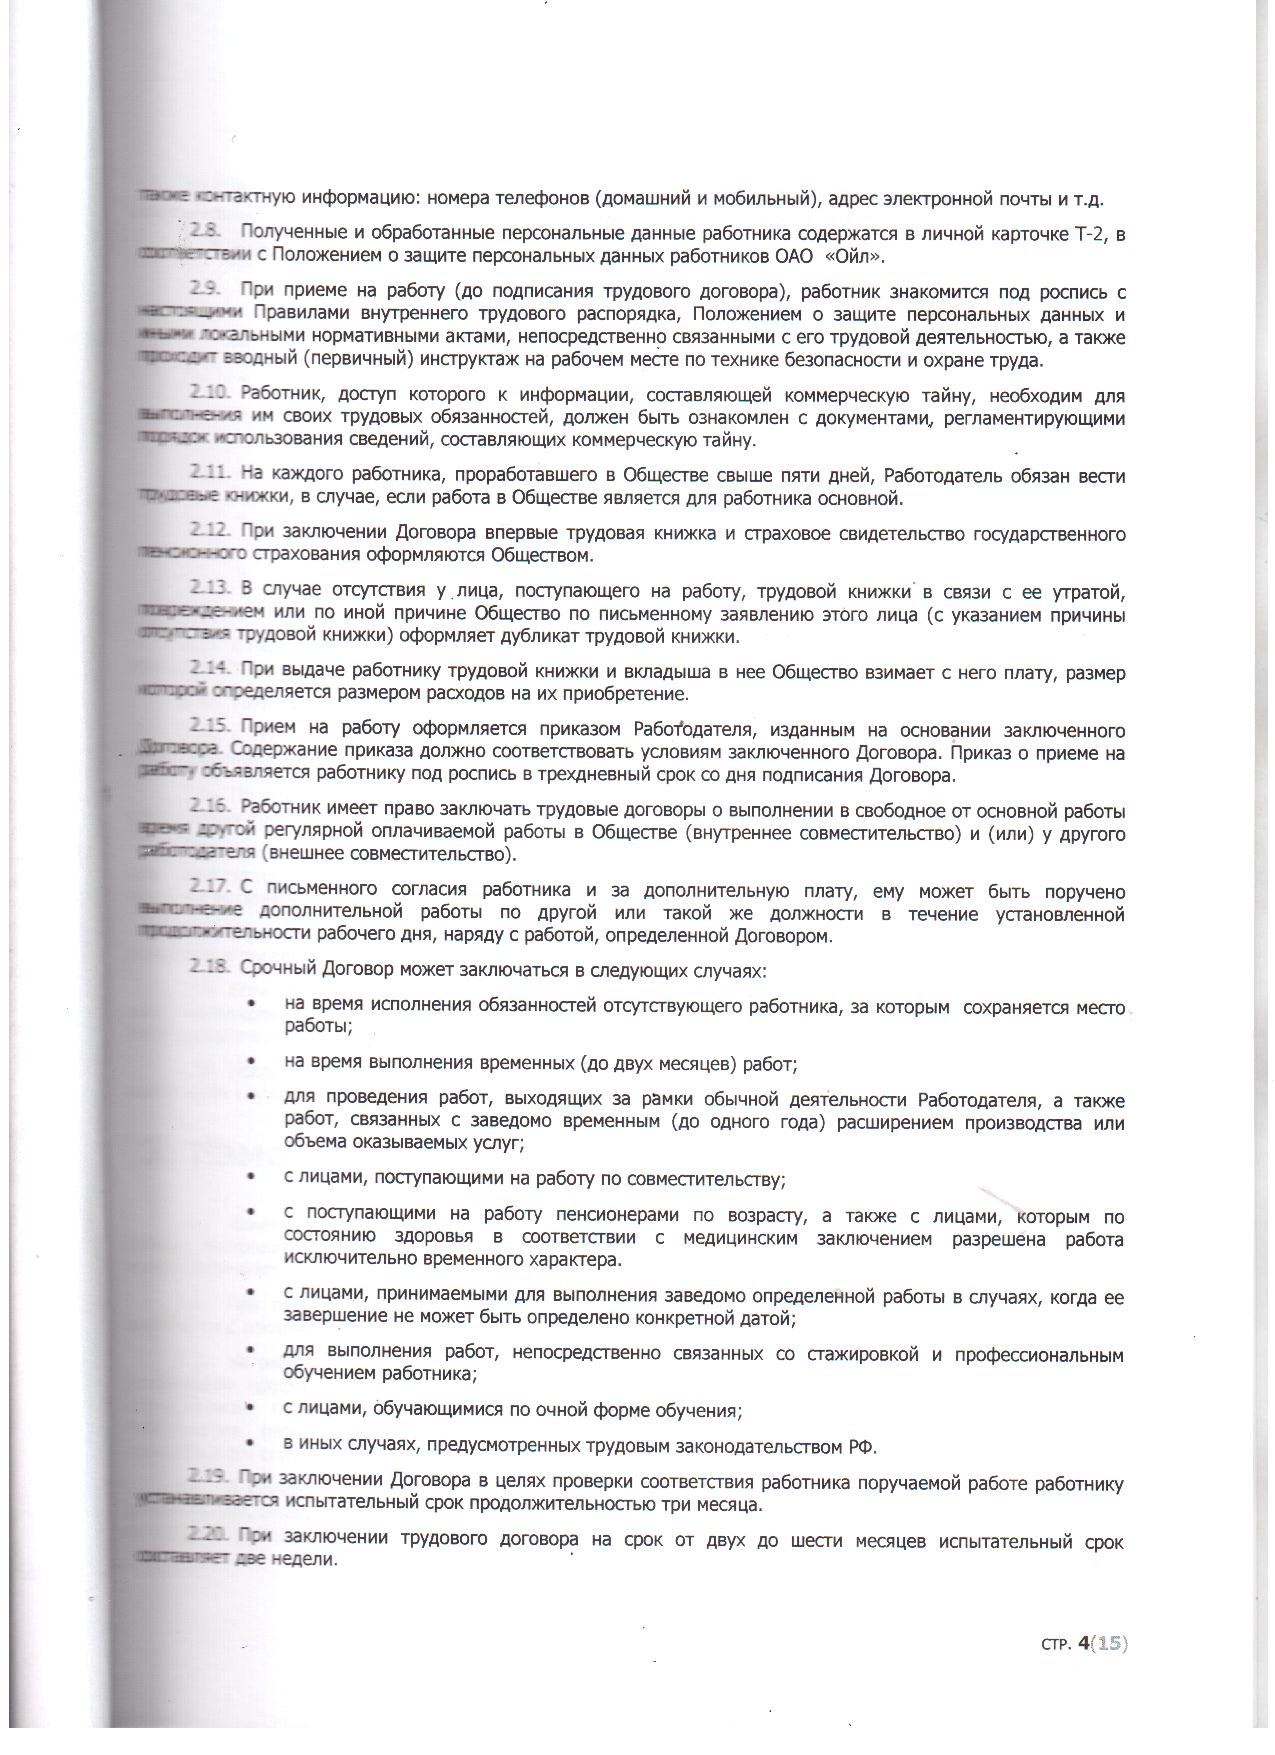 Правила внутреннего трудоговоро распорядка 4